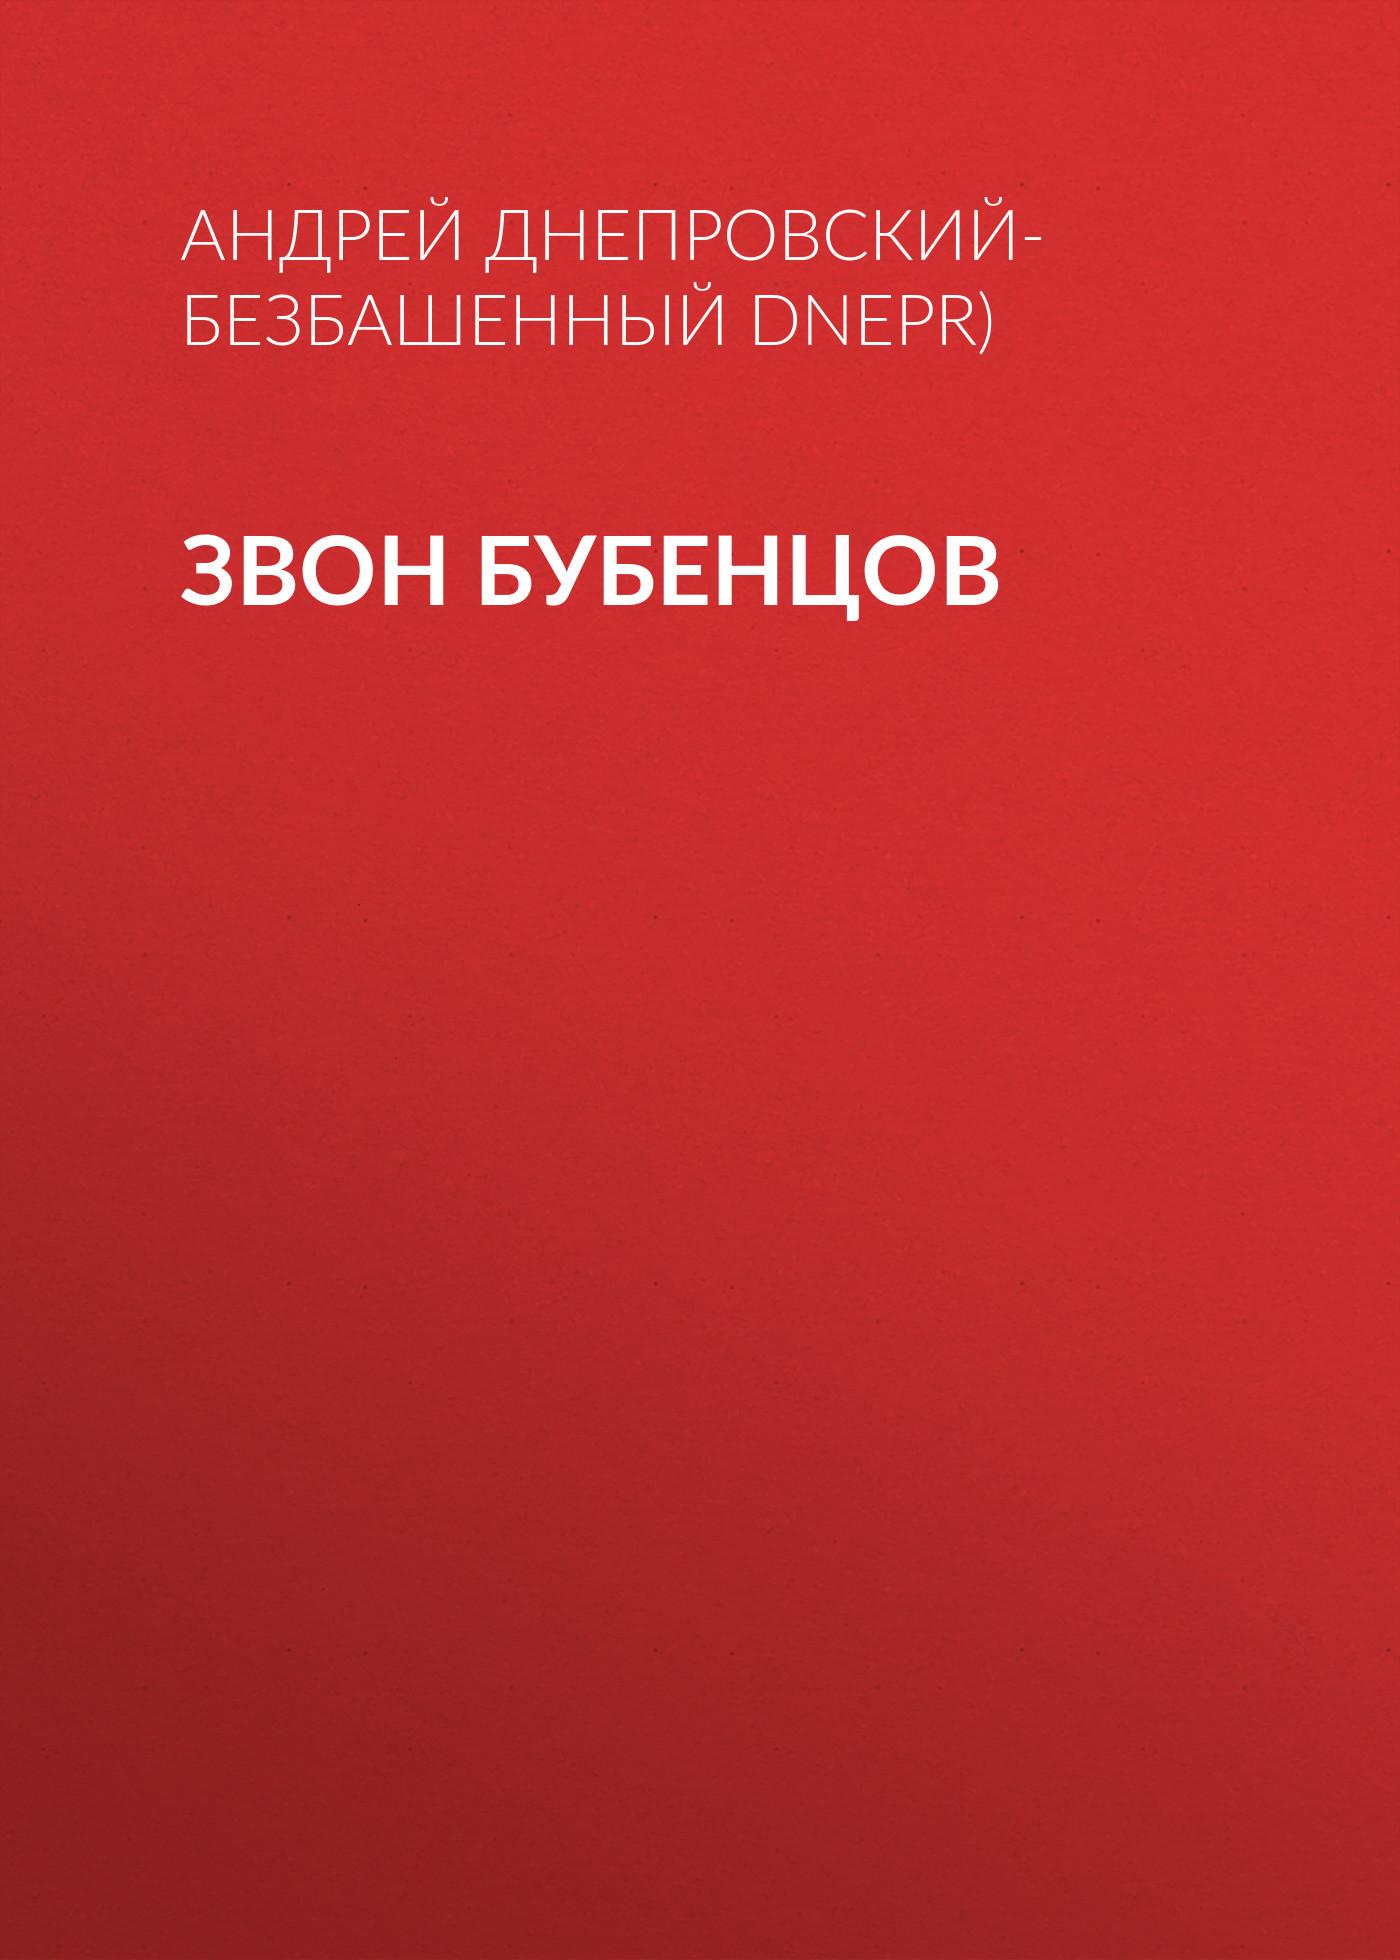 Андрей Днепровский-Безбашенный (A.DNEPR) Звон бубенцов цена